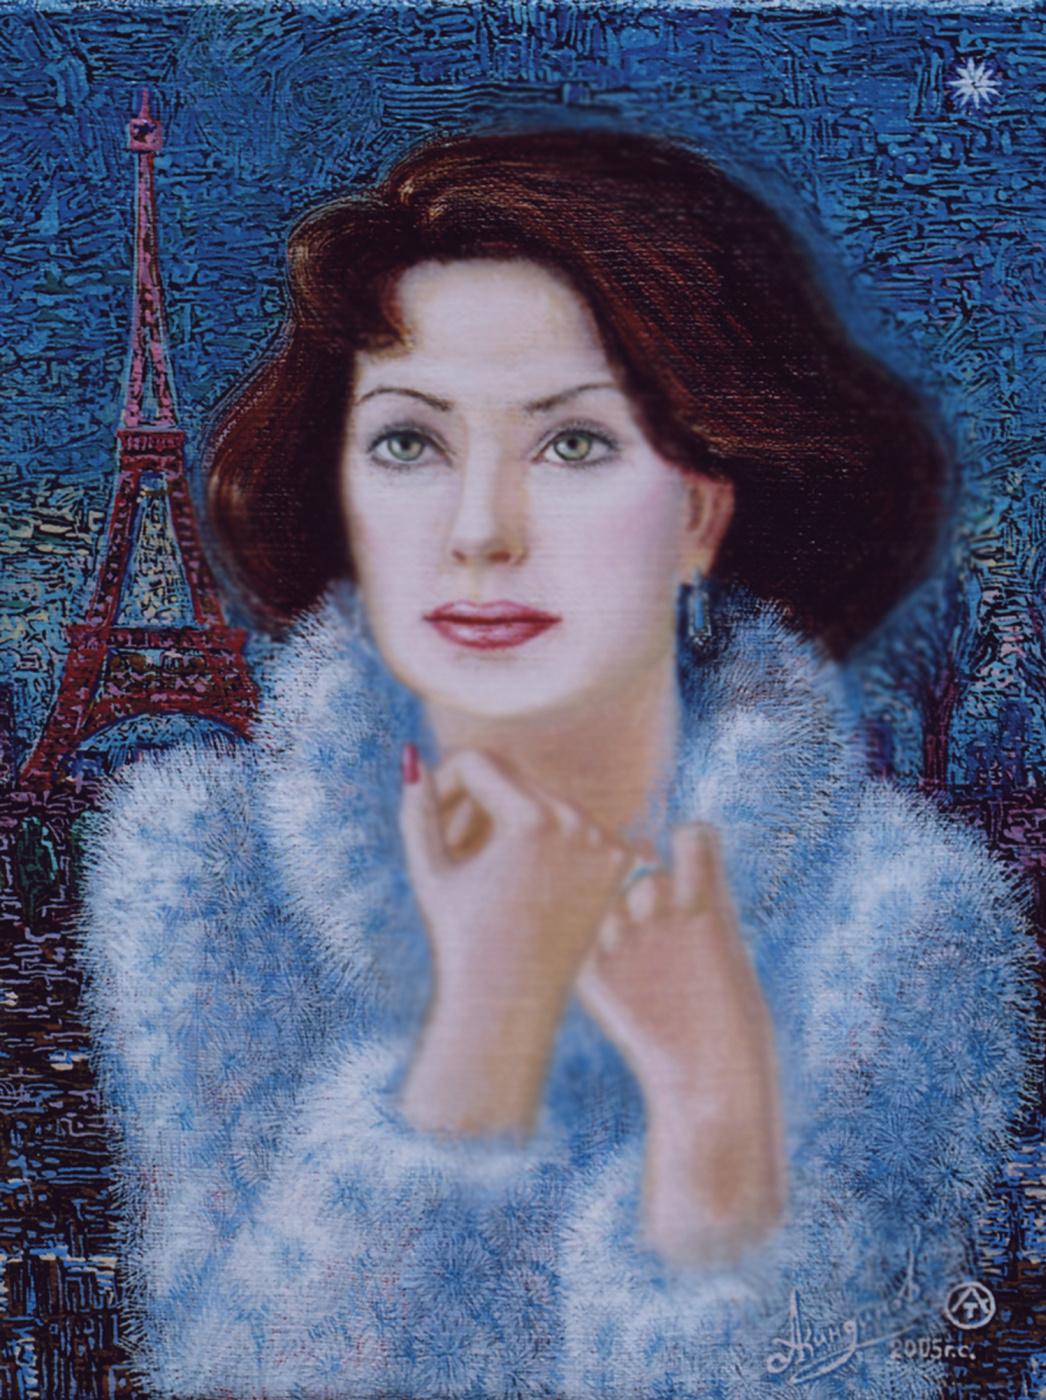 Алексей Петрович Акиндинов. Star of French cinema, portrait of Anna Pakhomova